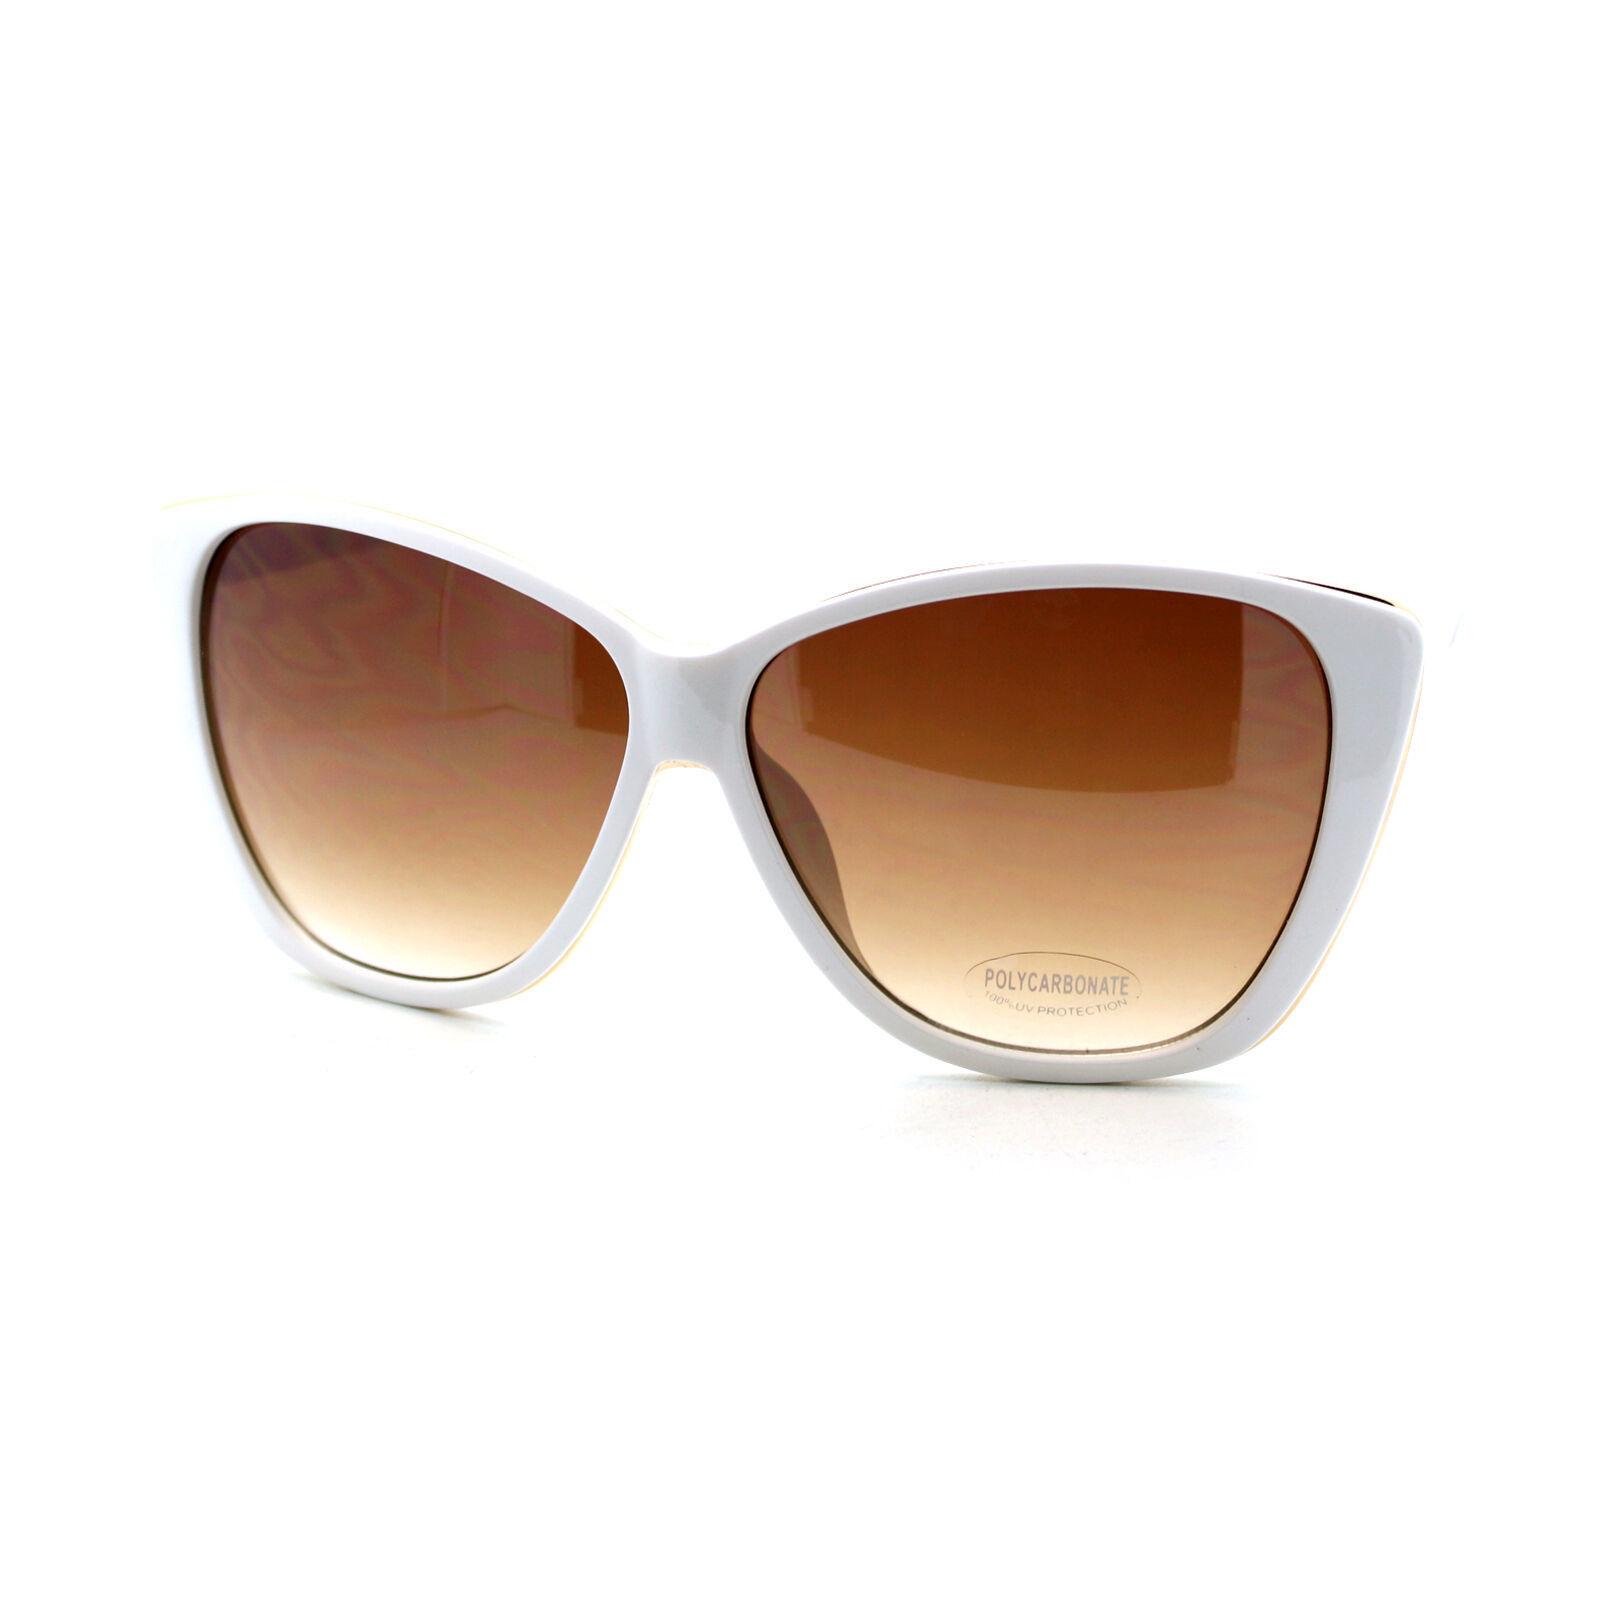 Oversized Square Butterfly Frame Sunglasses Womens Fashion Eyewear